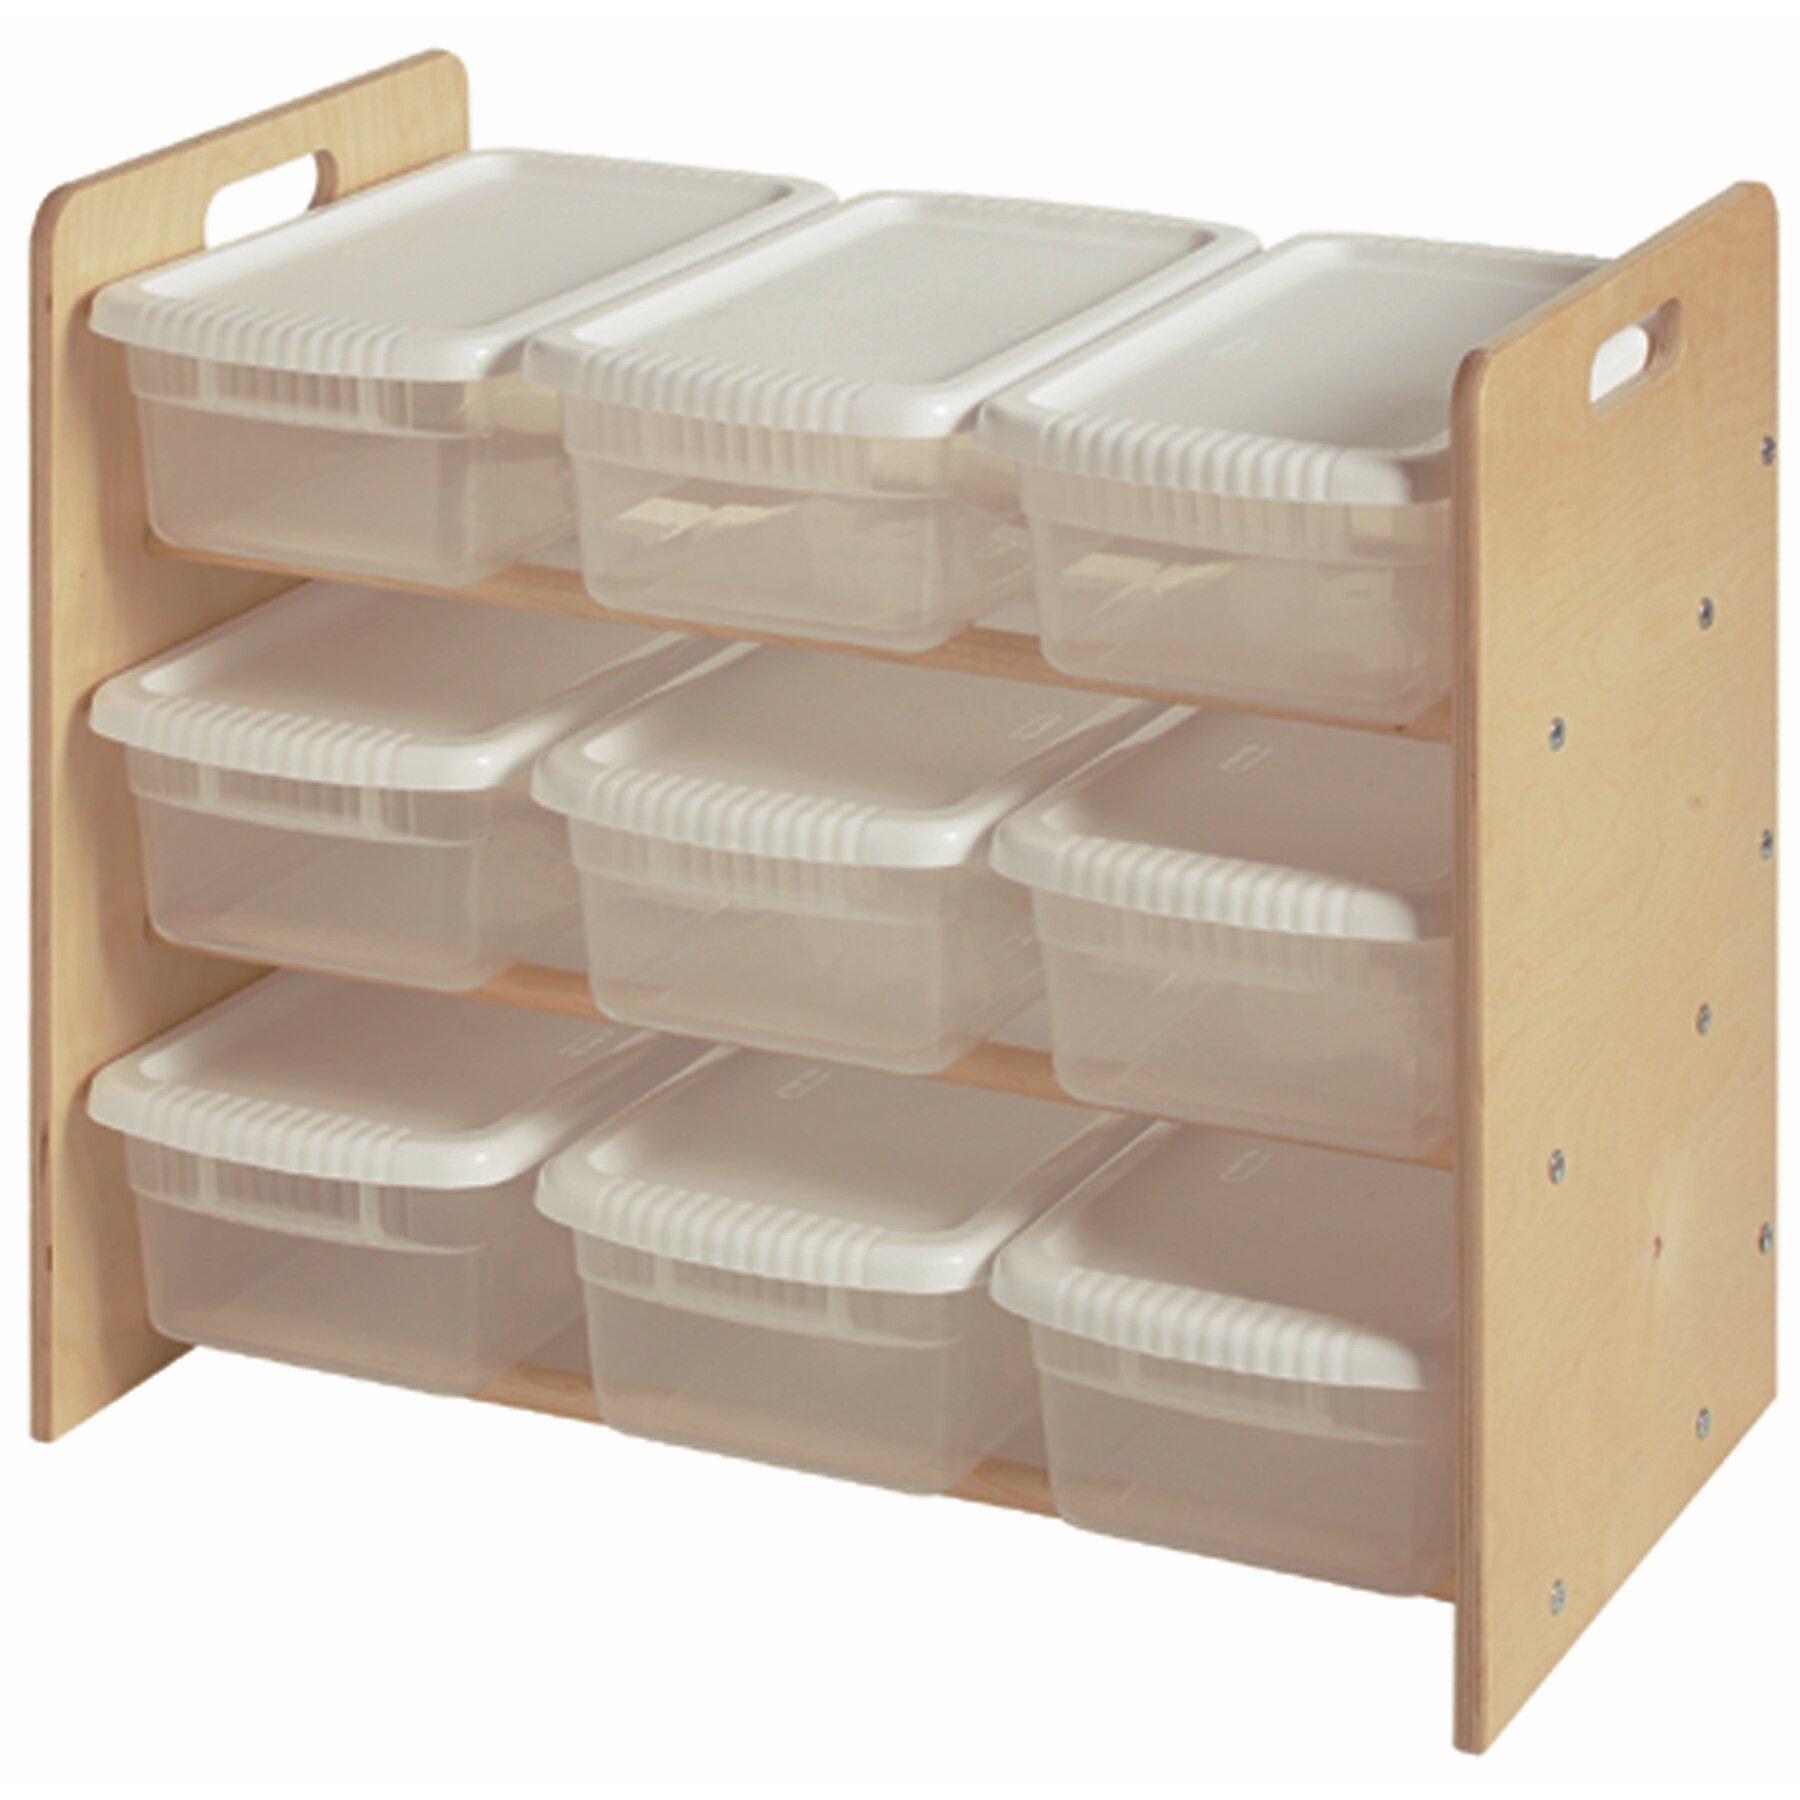 little colorado nine bin toy organizer 9 compartment cubby. Black Bedroom Furniture Sets. Home Design Ideas